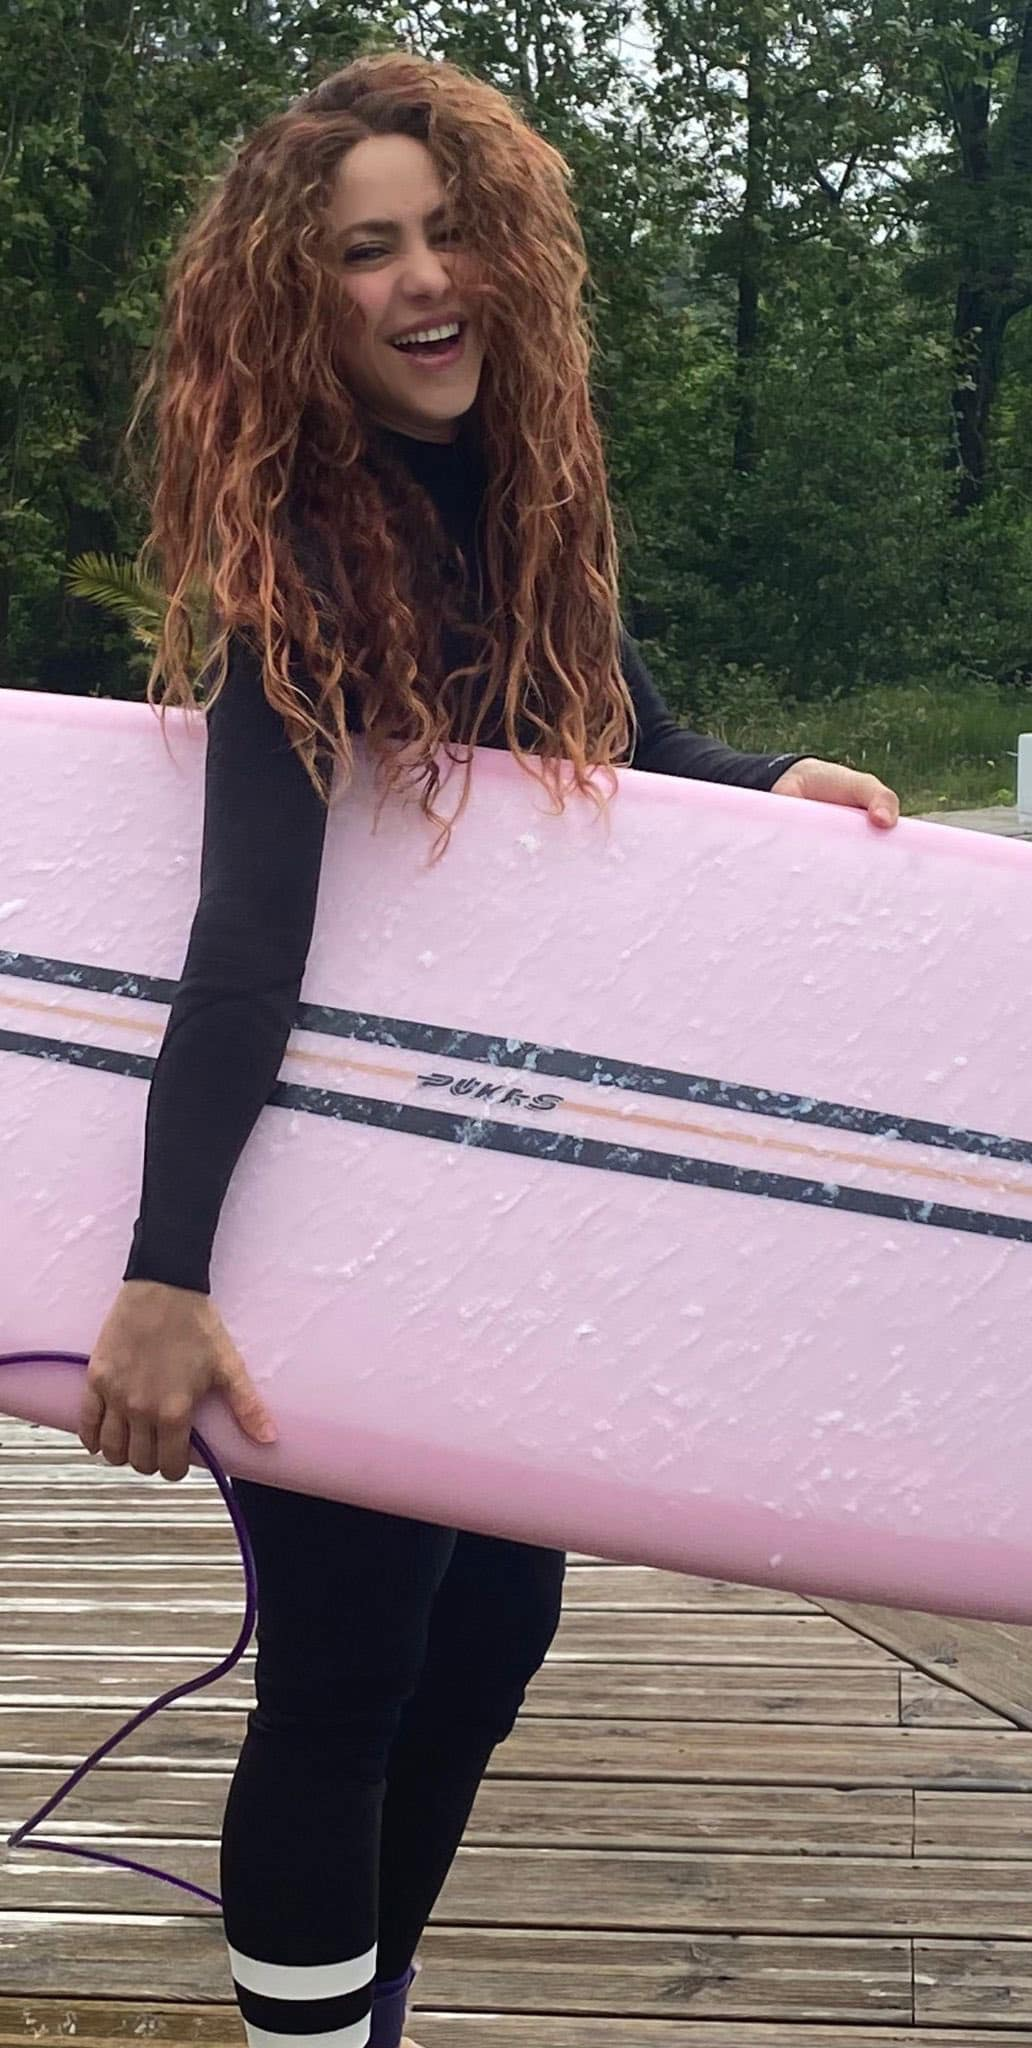 Shakira tabla Pukas copia - Shakira luce en un vídeo su estilo surfero en Aizarnazabal